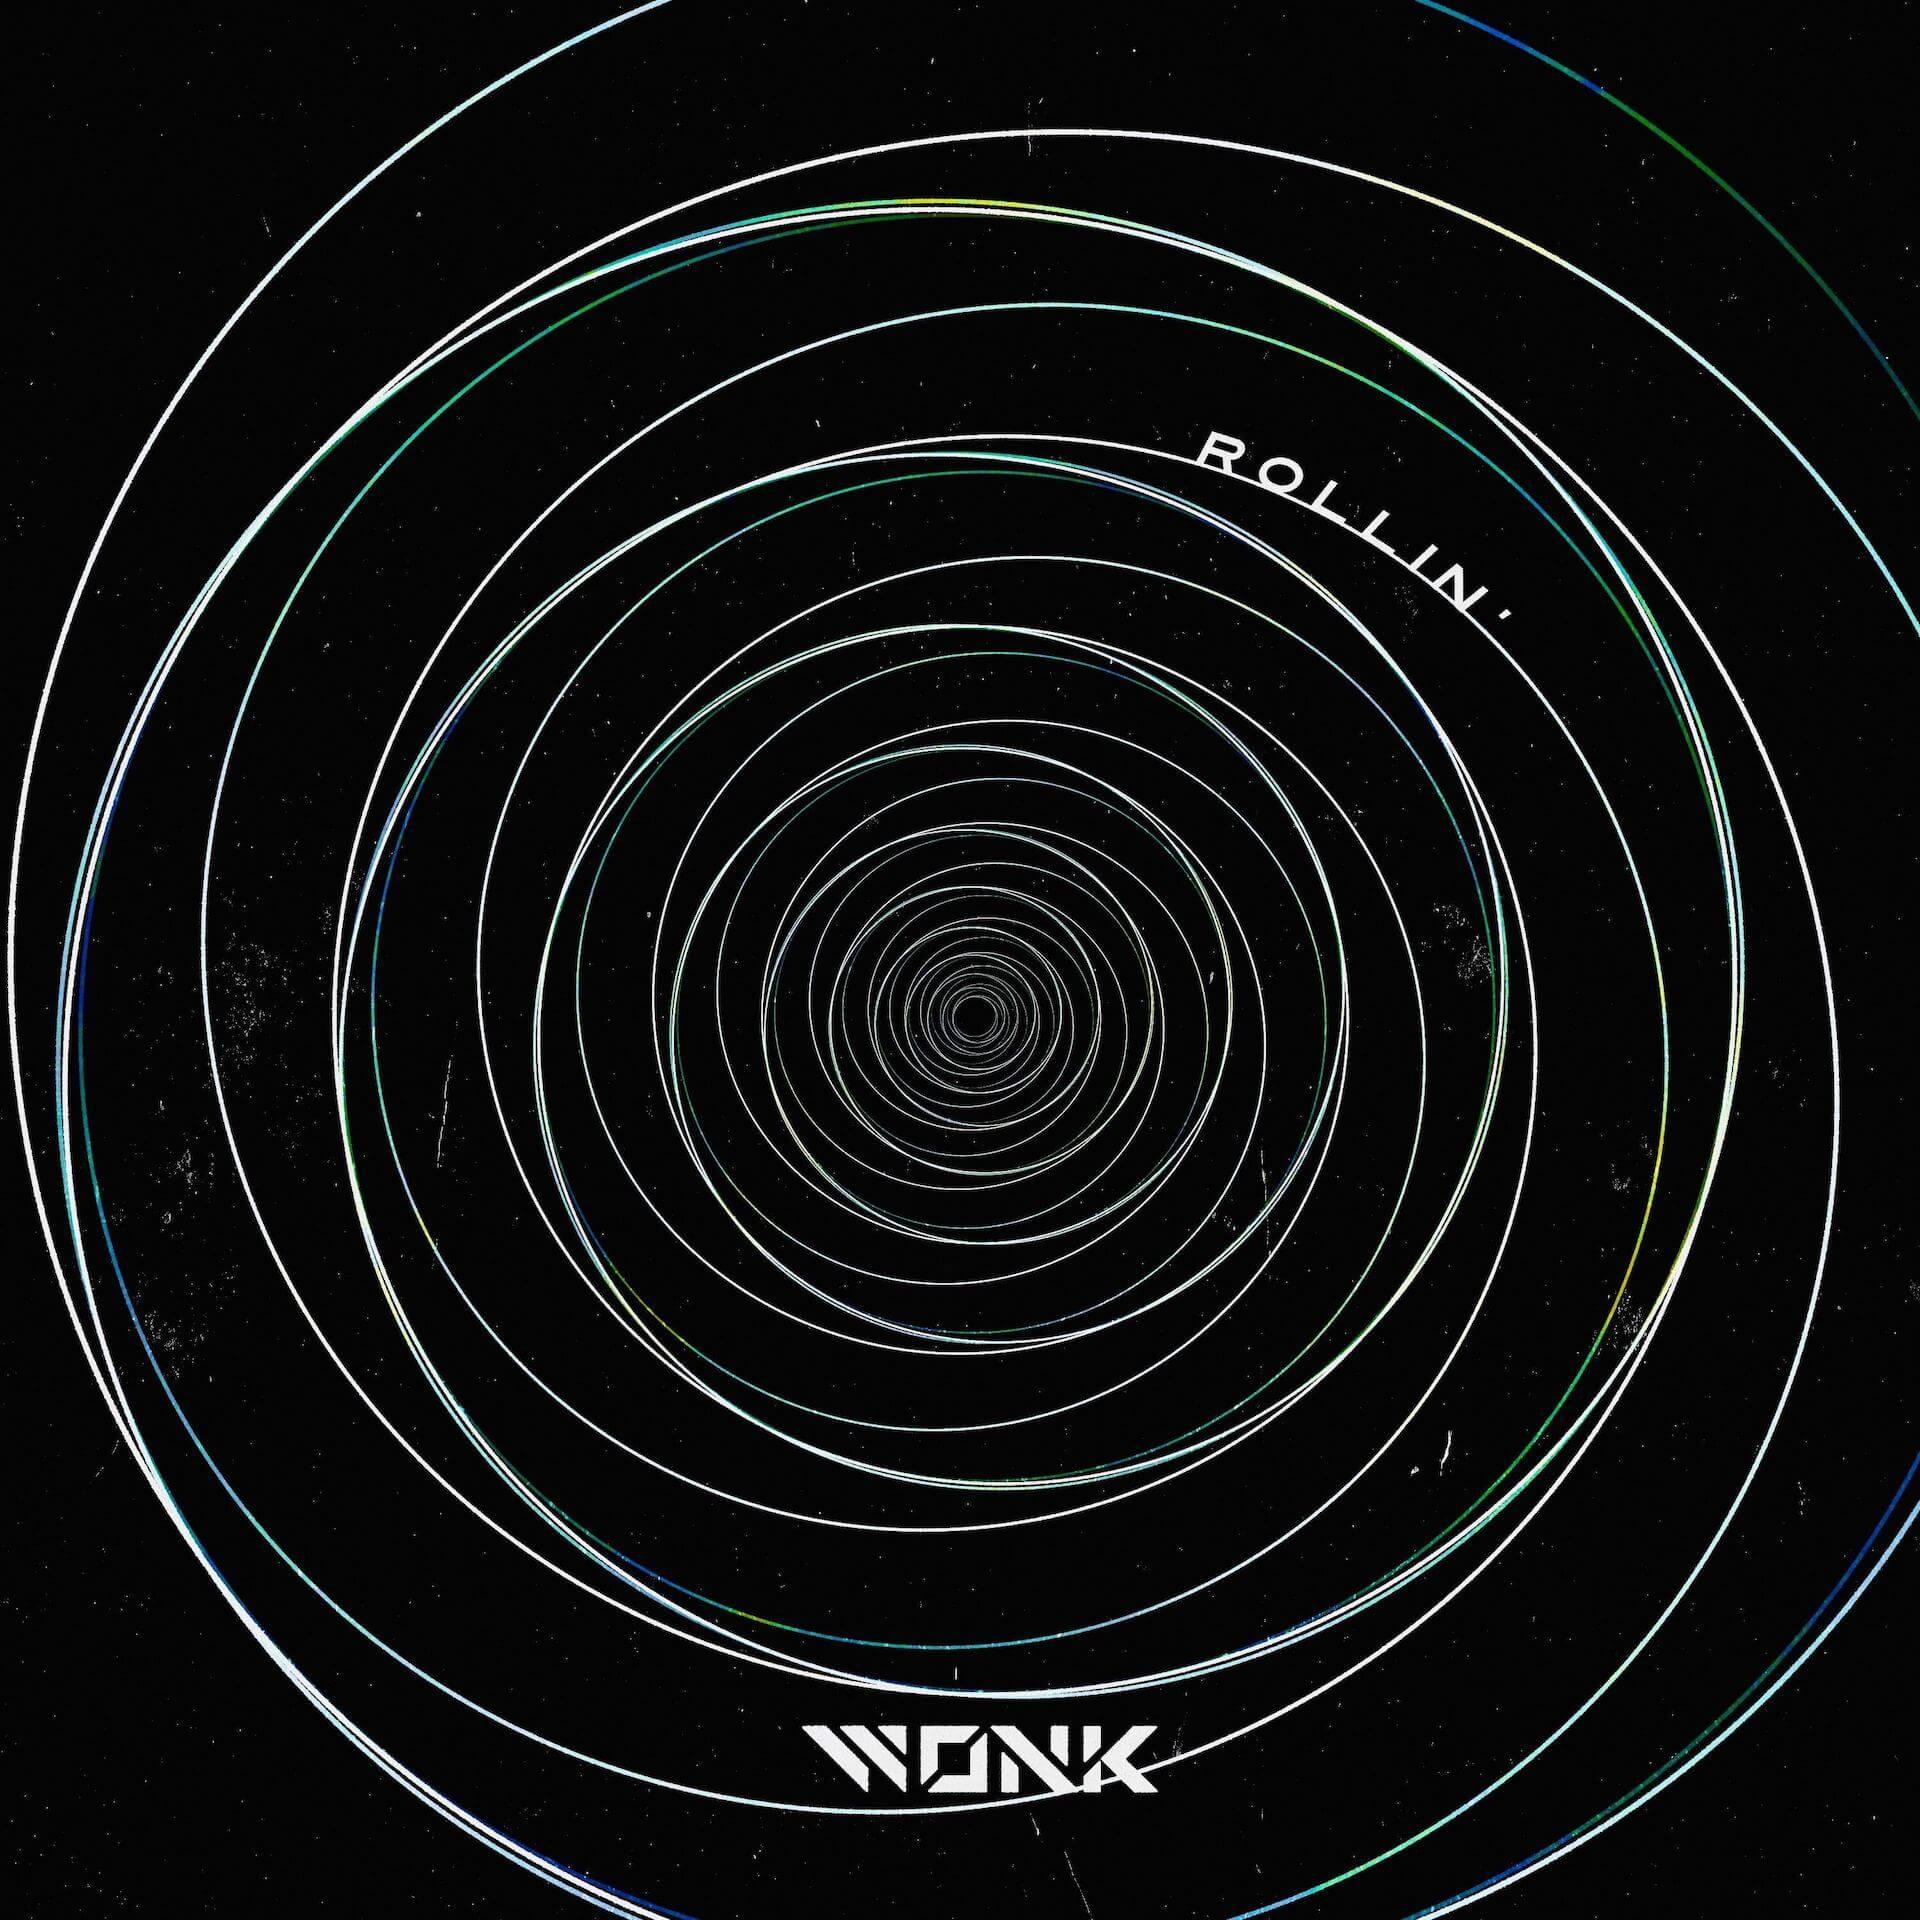 WONKのニューアルバム『EYES』に合わせたニュービジュアルが公開!リリースツアー延期も発表 music200603_wonk_3